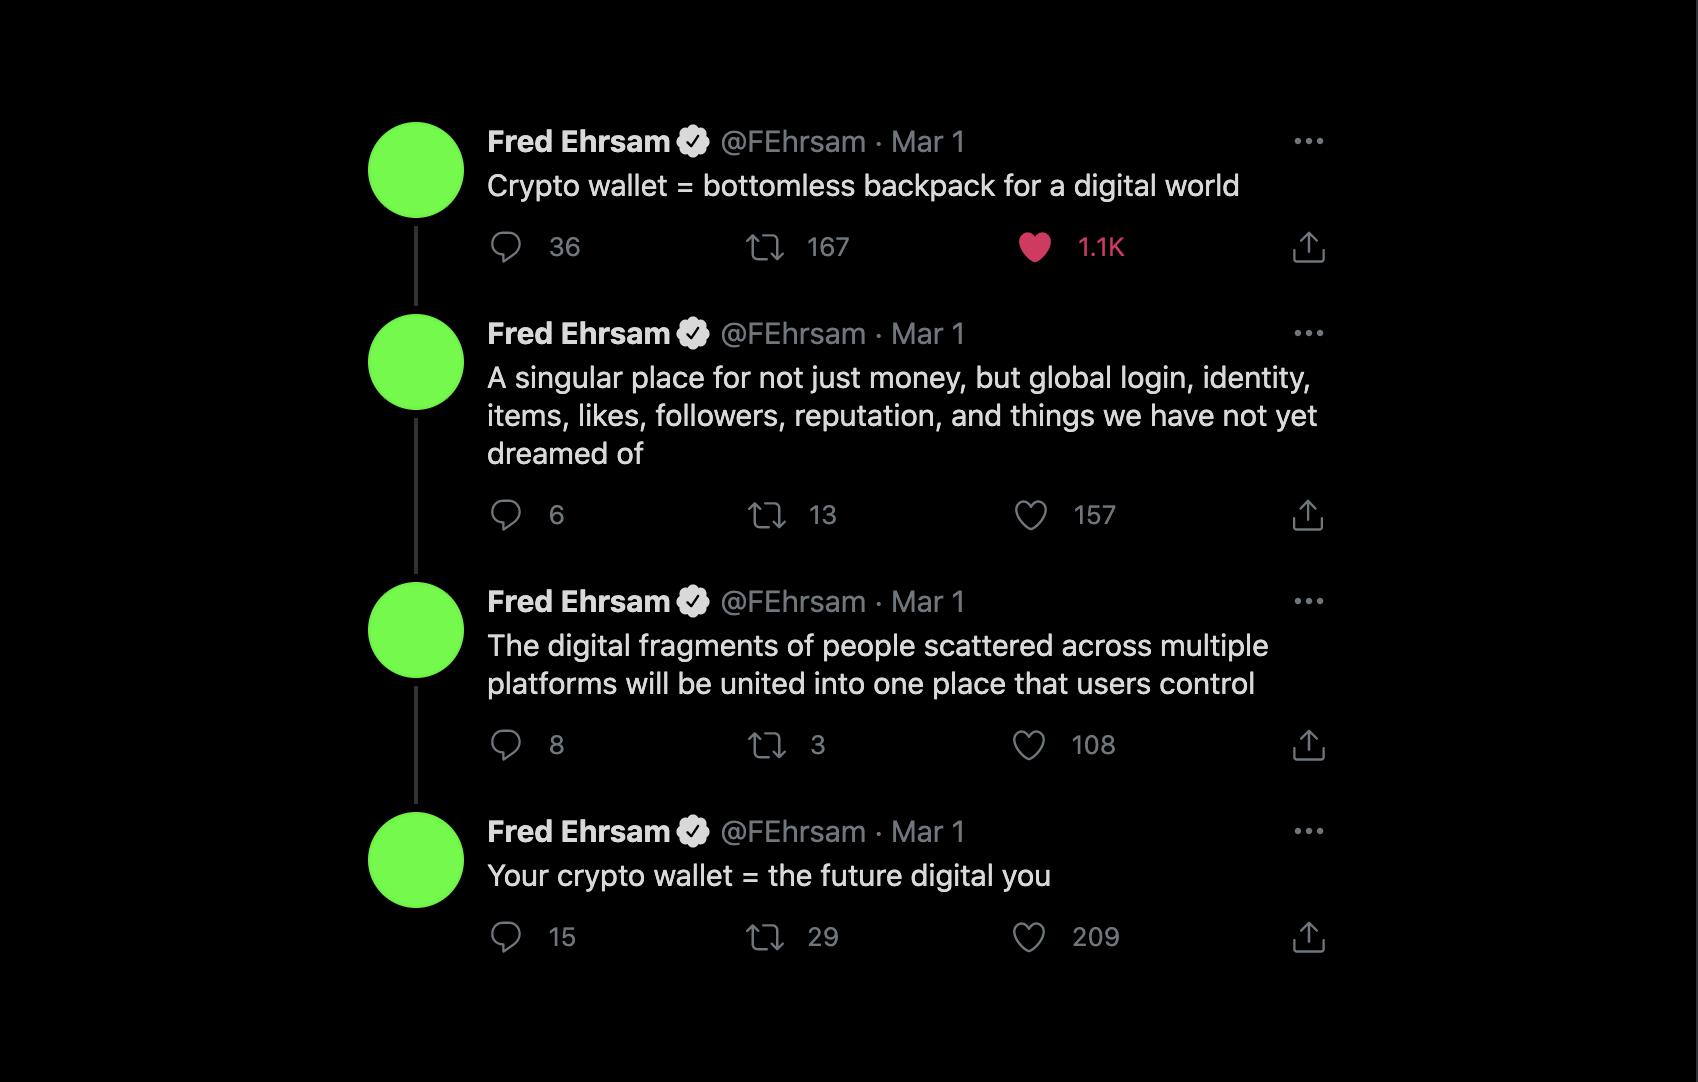 Fred Ehrsam tweets: